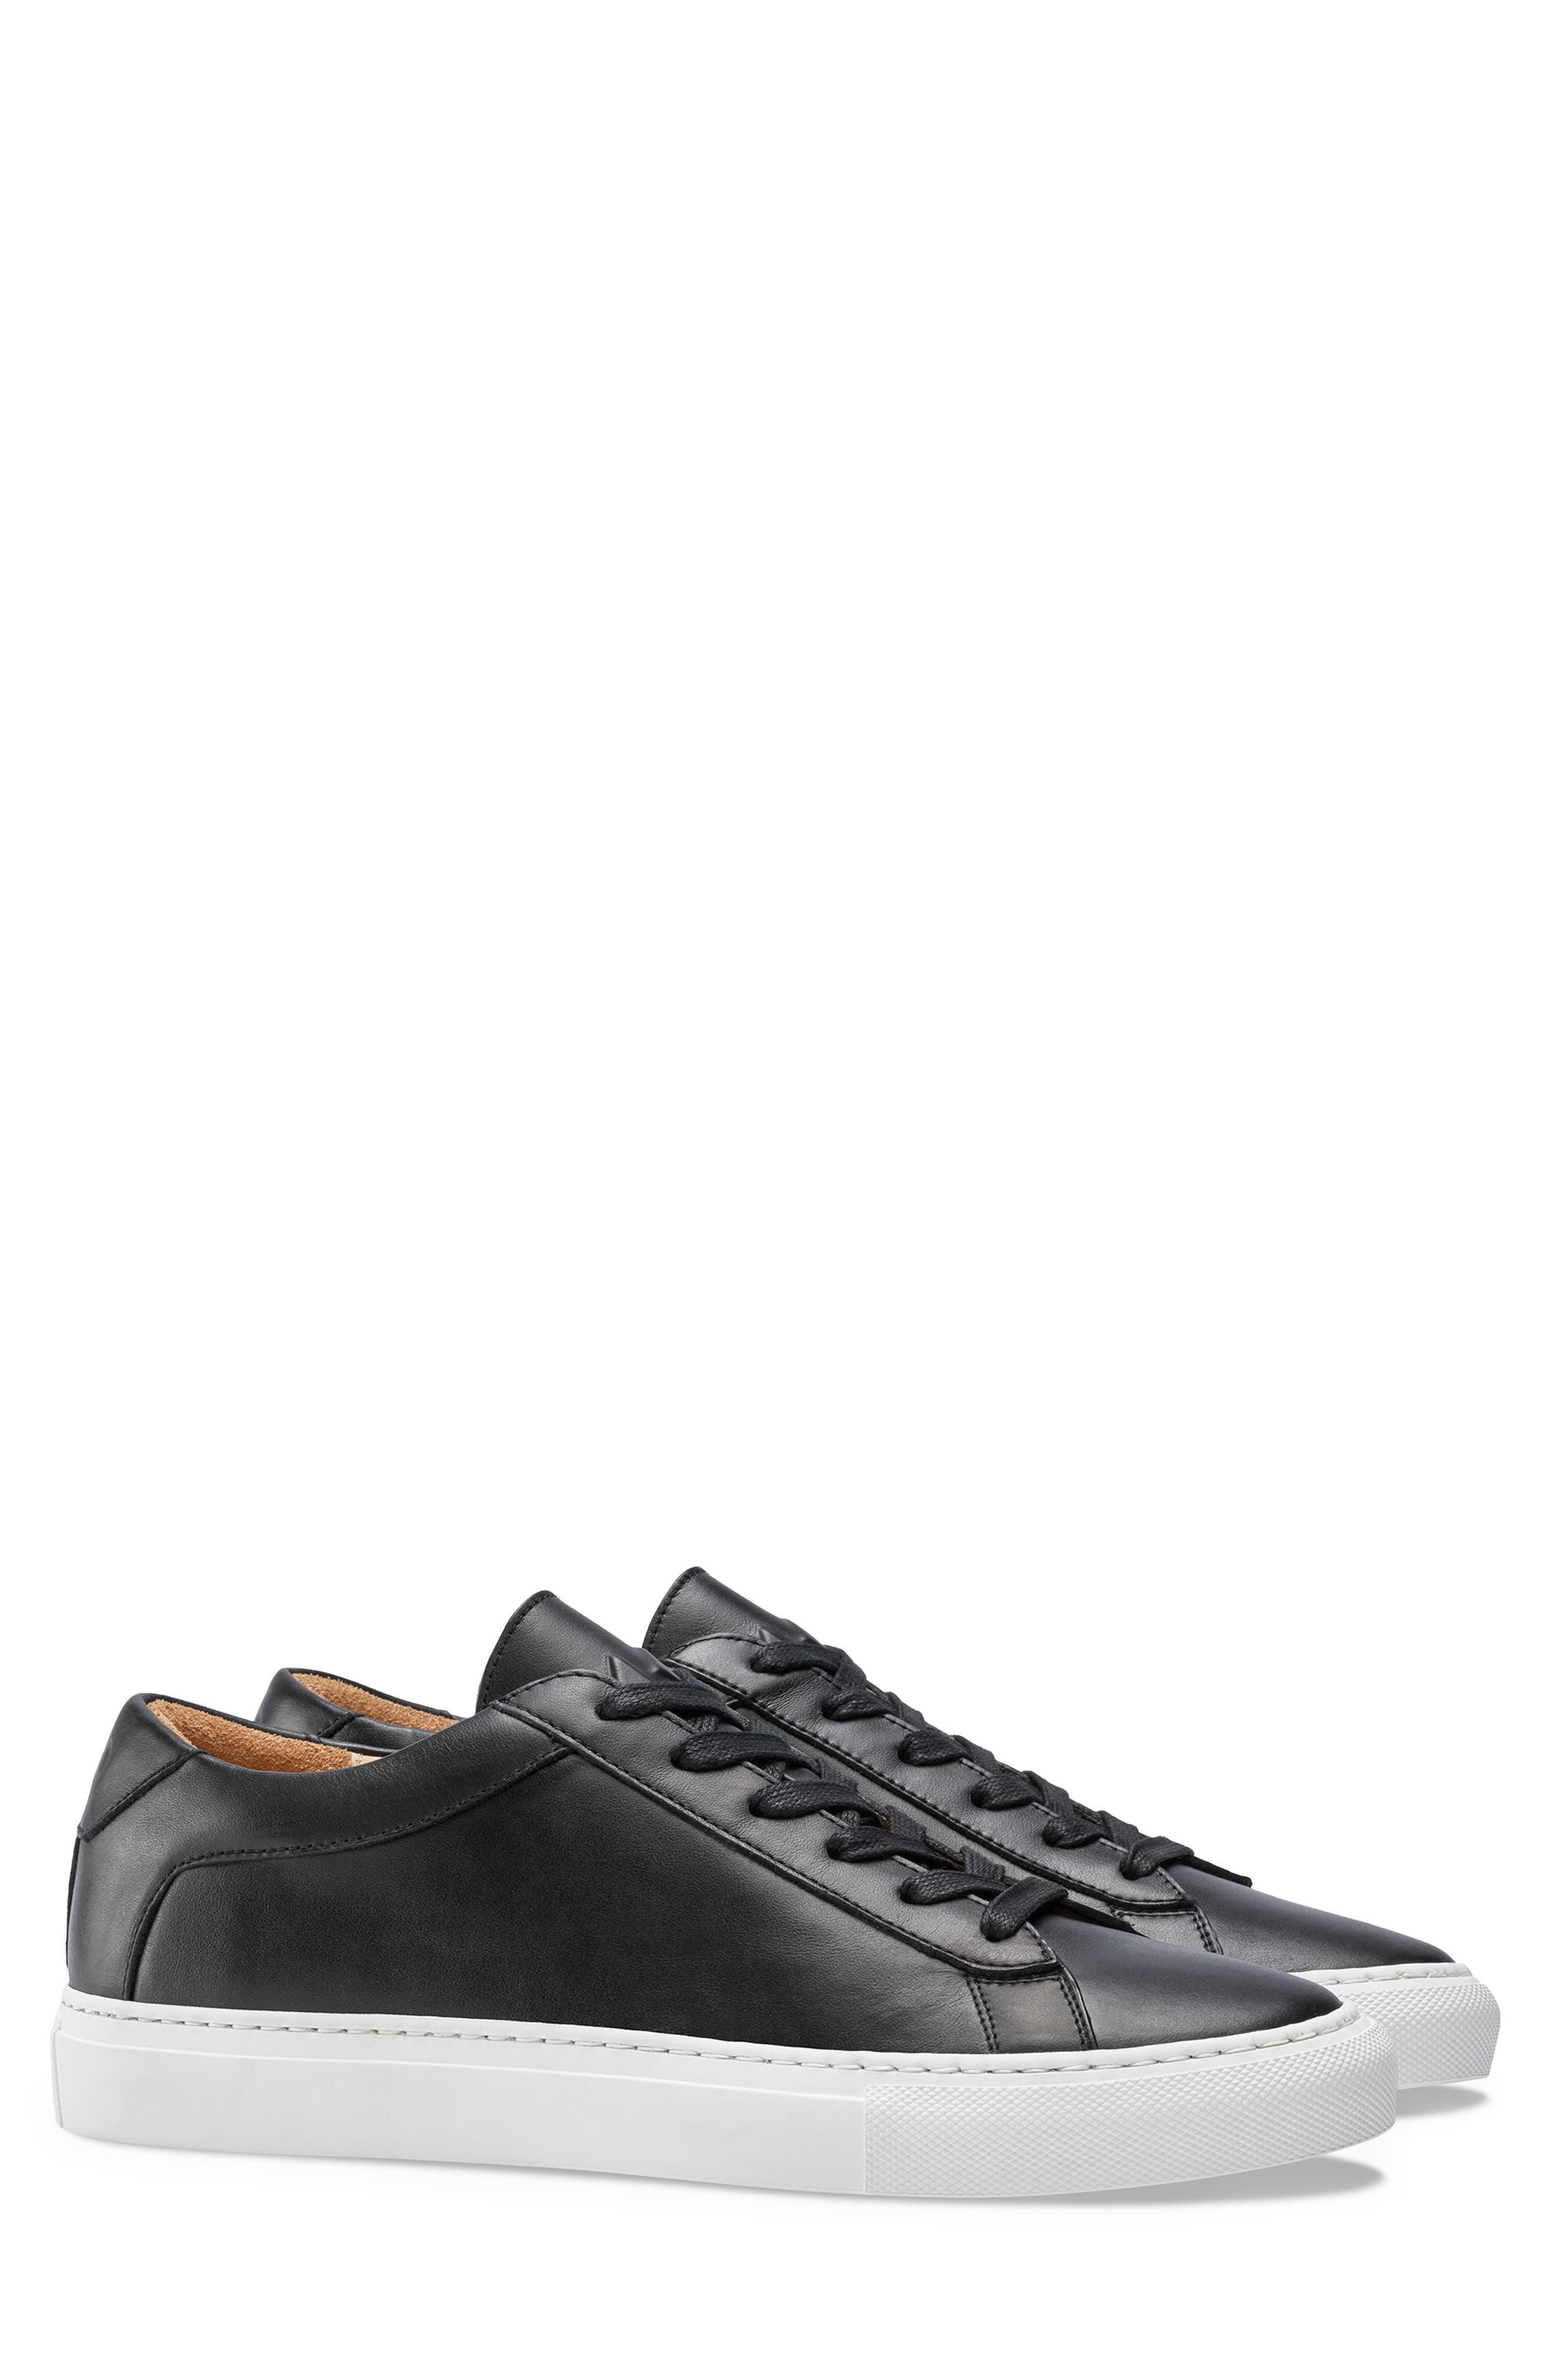 KOIO, Capri Sneaker, Main thumbnail 1, color, ONYX